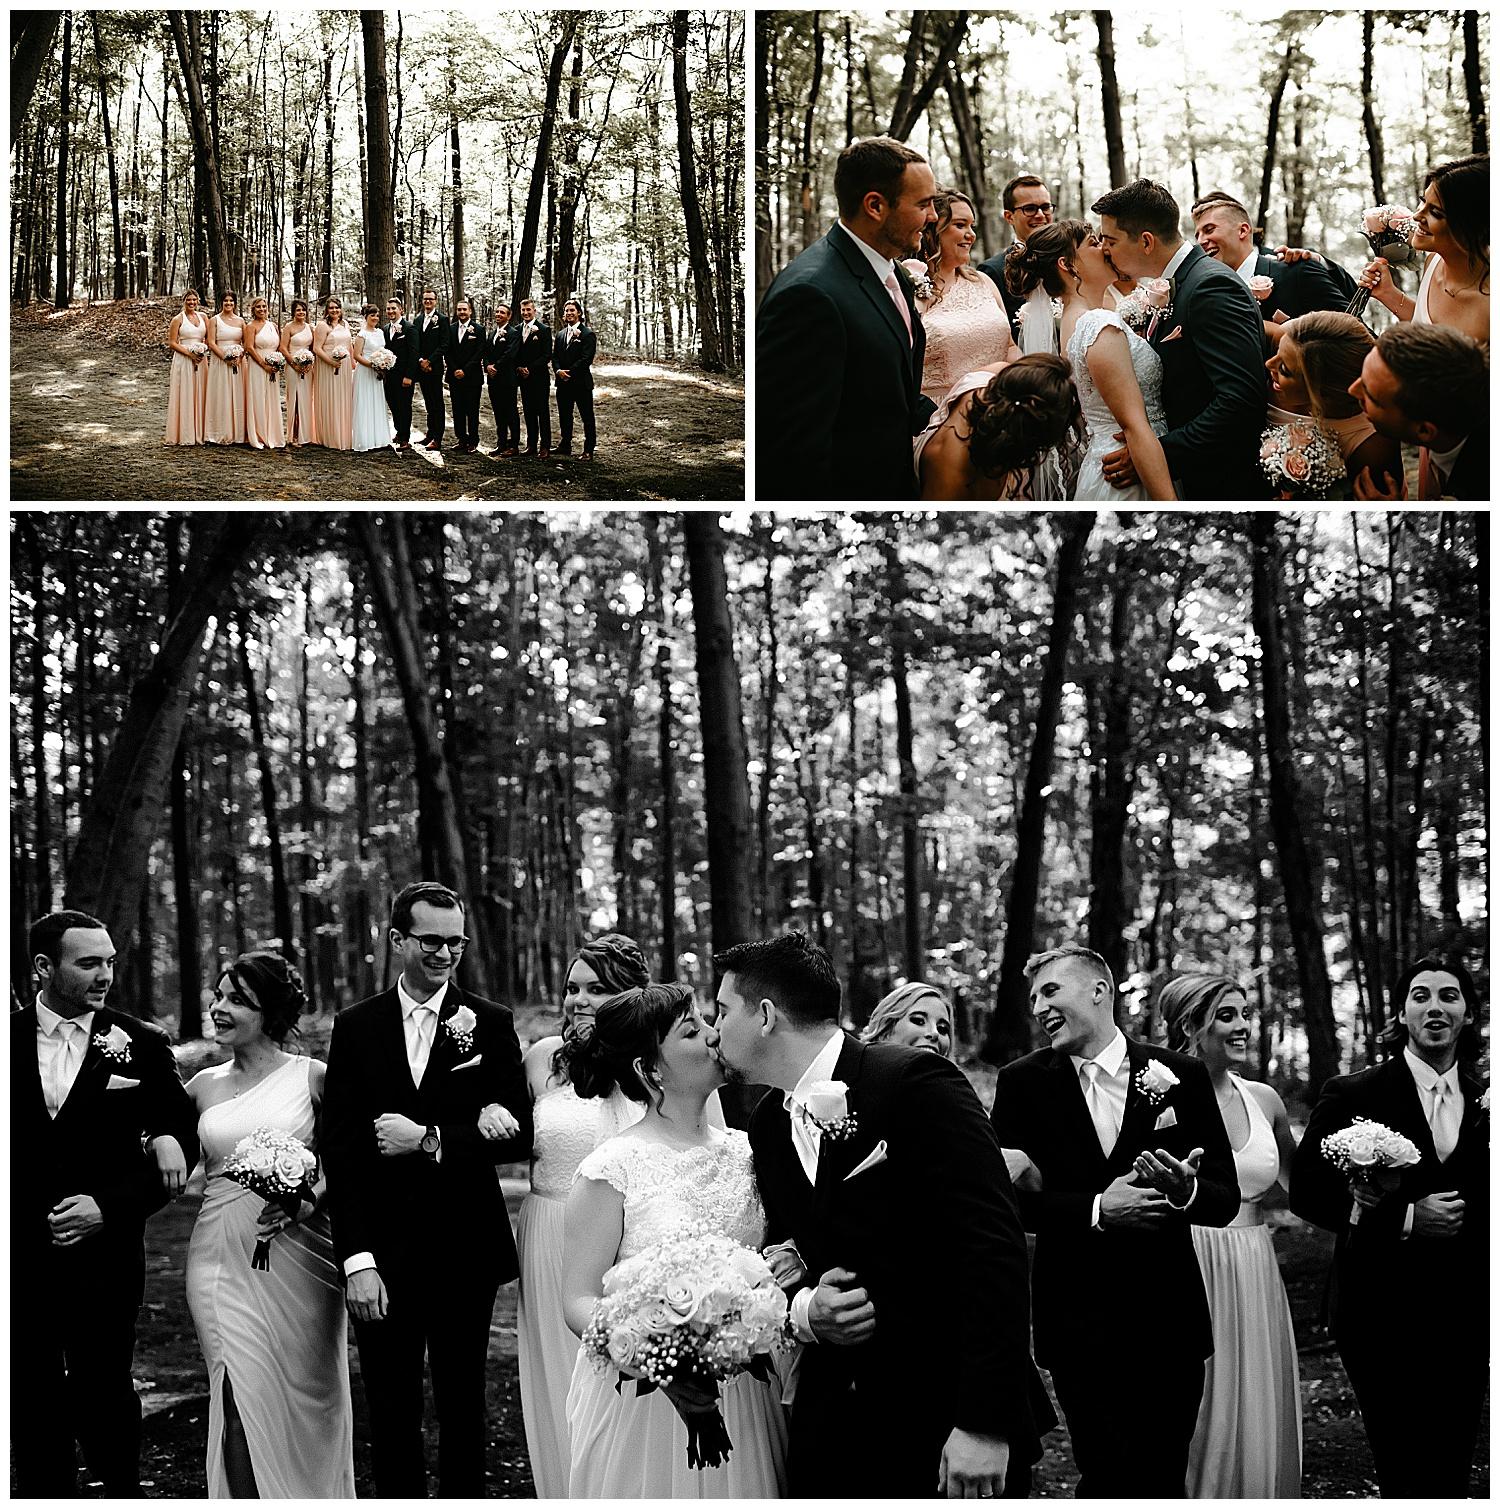 NEPA-Mount-Pocono-Wedding-Photographer-at-the-Stroudsmoor-Country-Inn-Stroudsburg-PA_0044.jpg